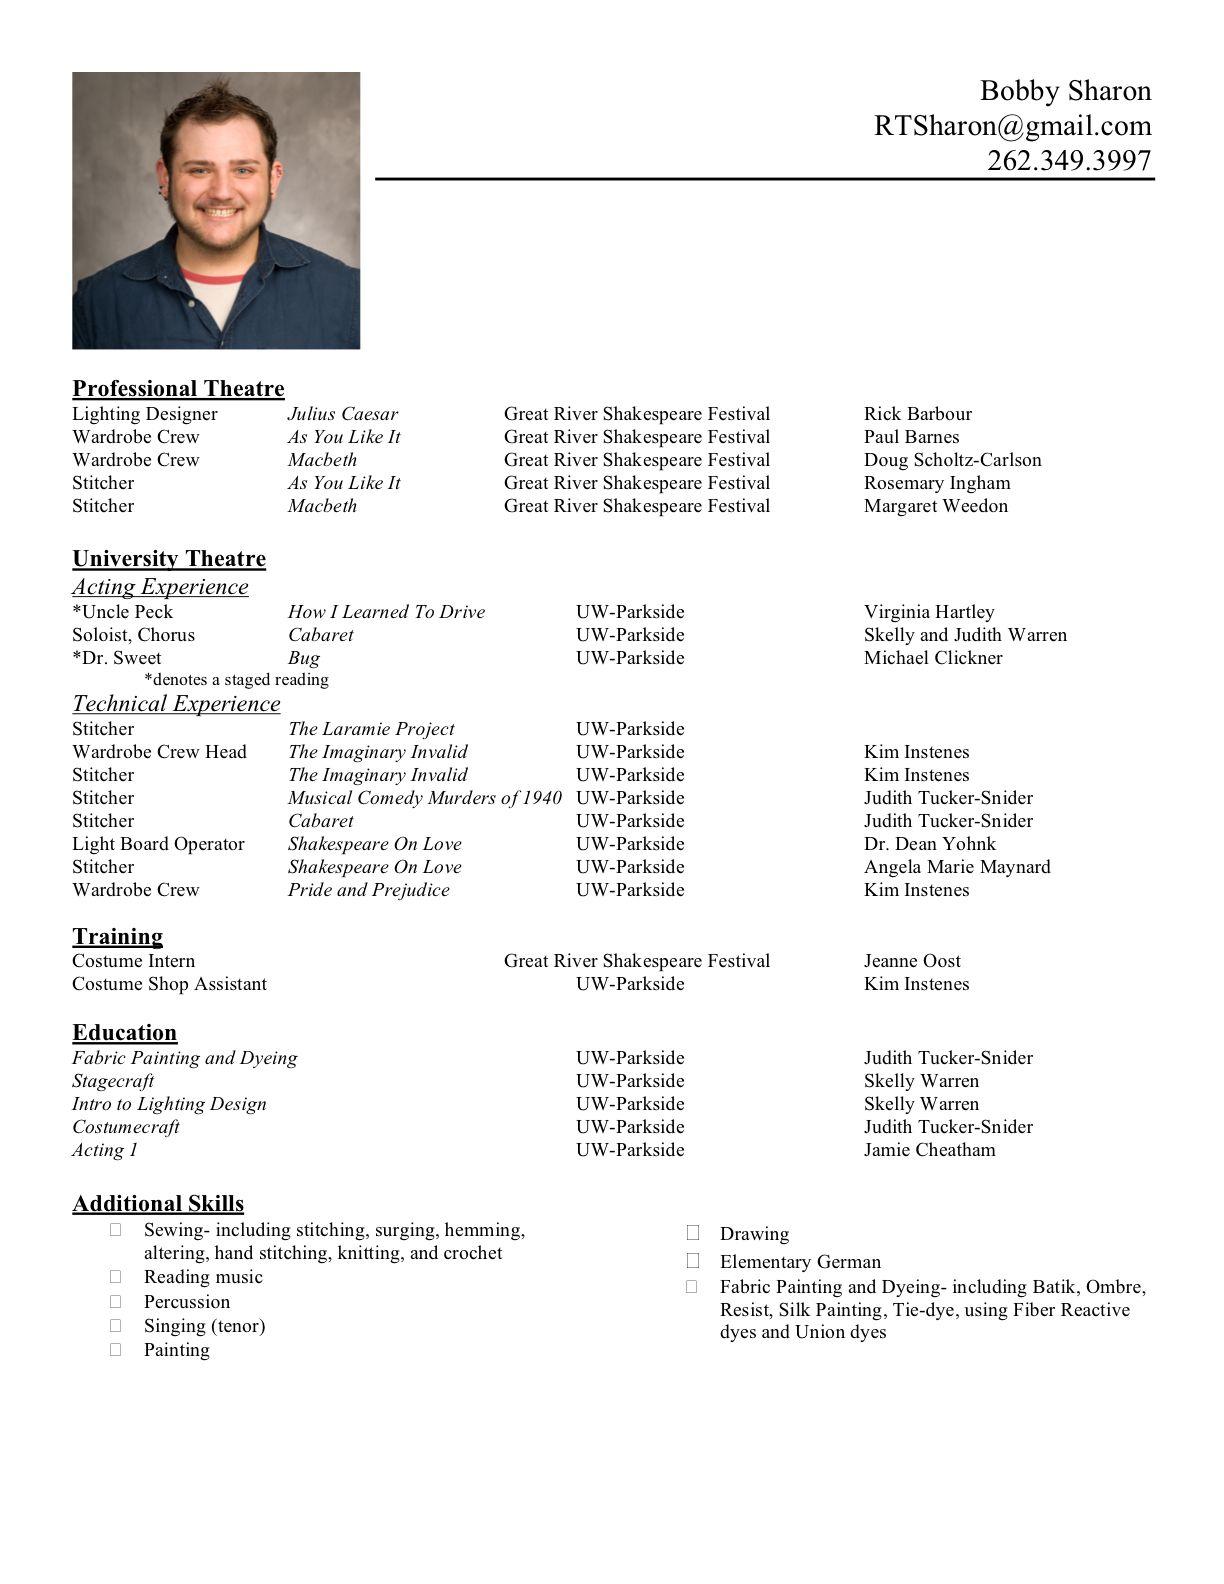 Curriculum Vitae Format PDF - http://www.resumecareer.info/curricu ...